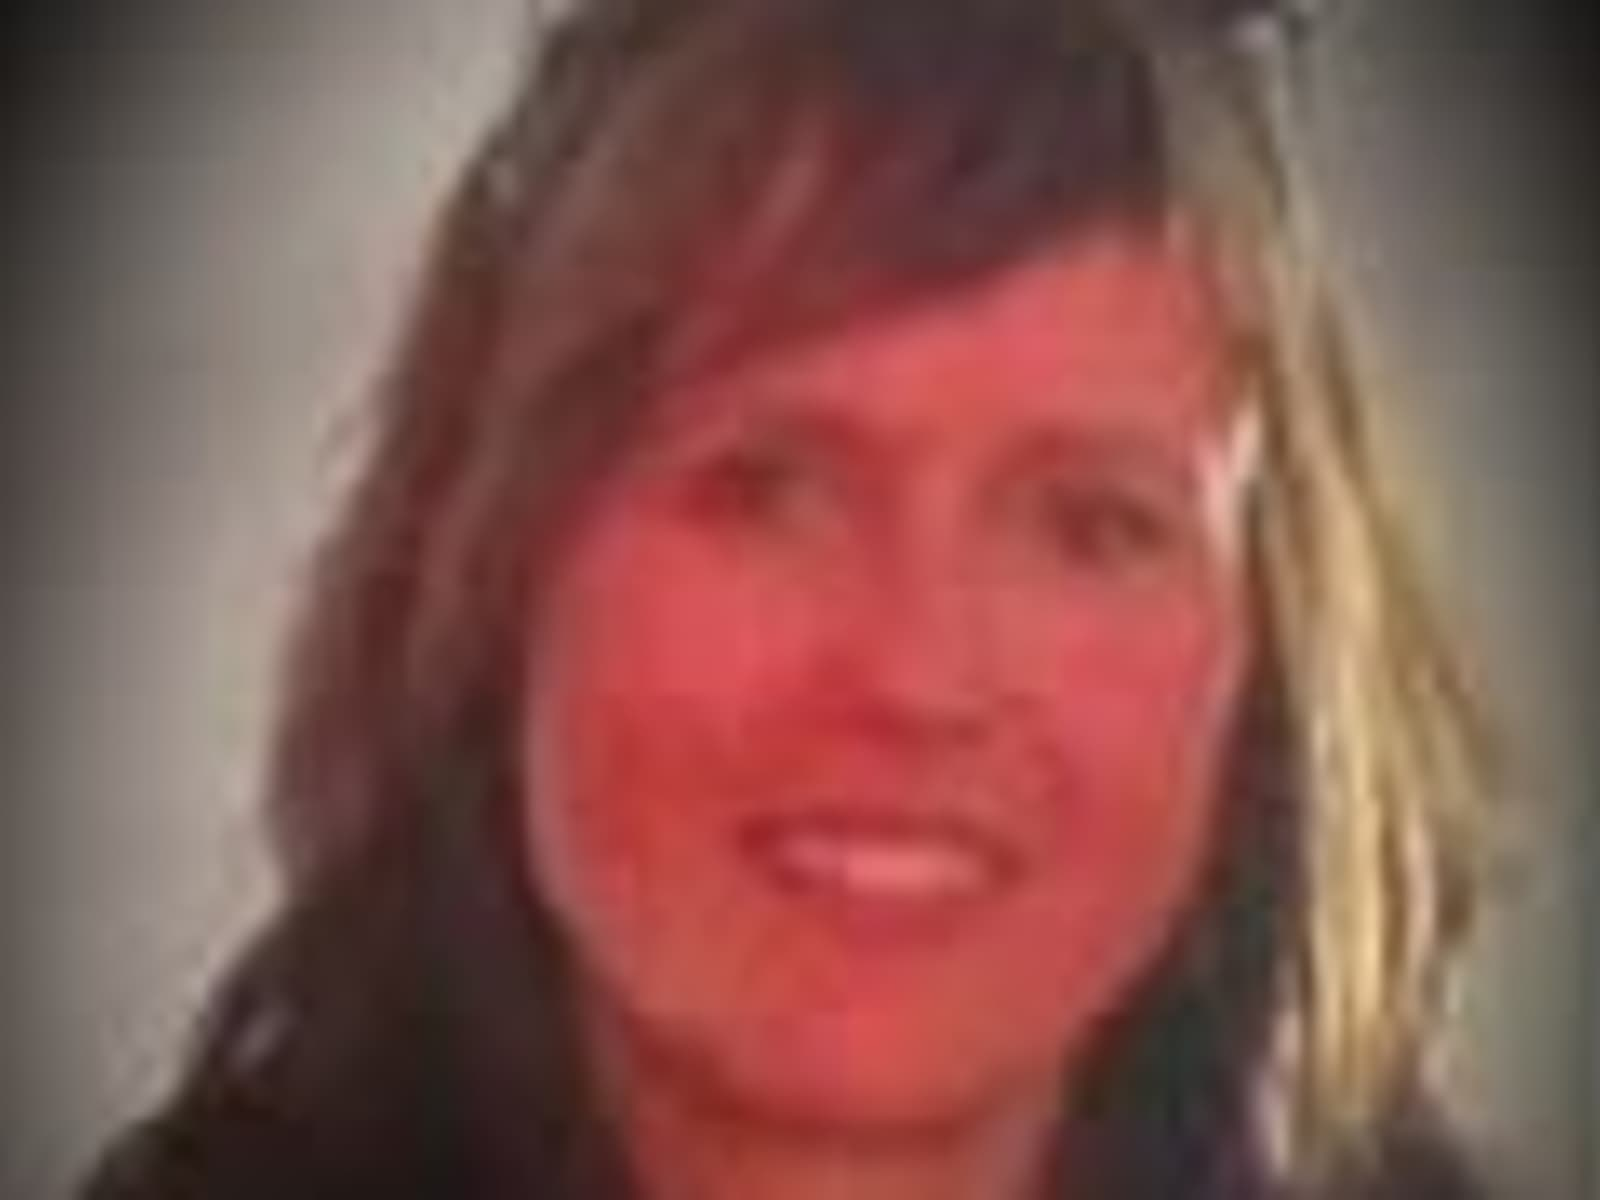 Joanne from Calgary, Alberta, Canada